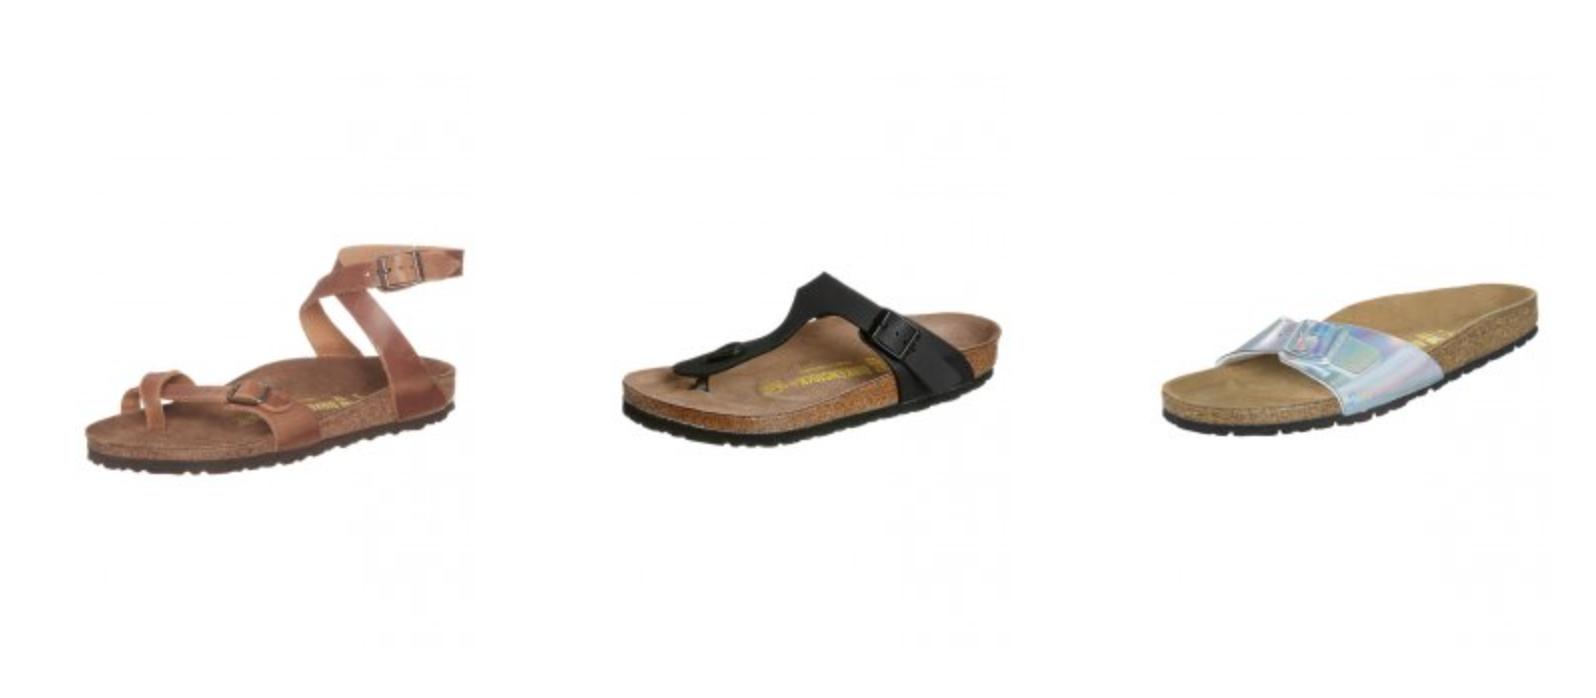 competitive price e3674 81a8f Birkenstock Outlet – moderne Schuhe für die gesamte Familie ...